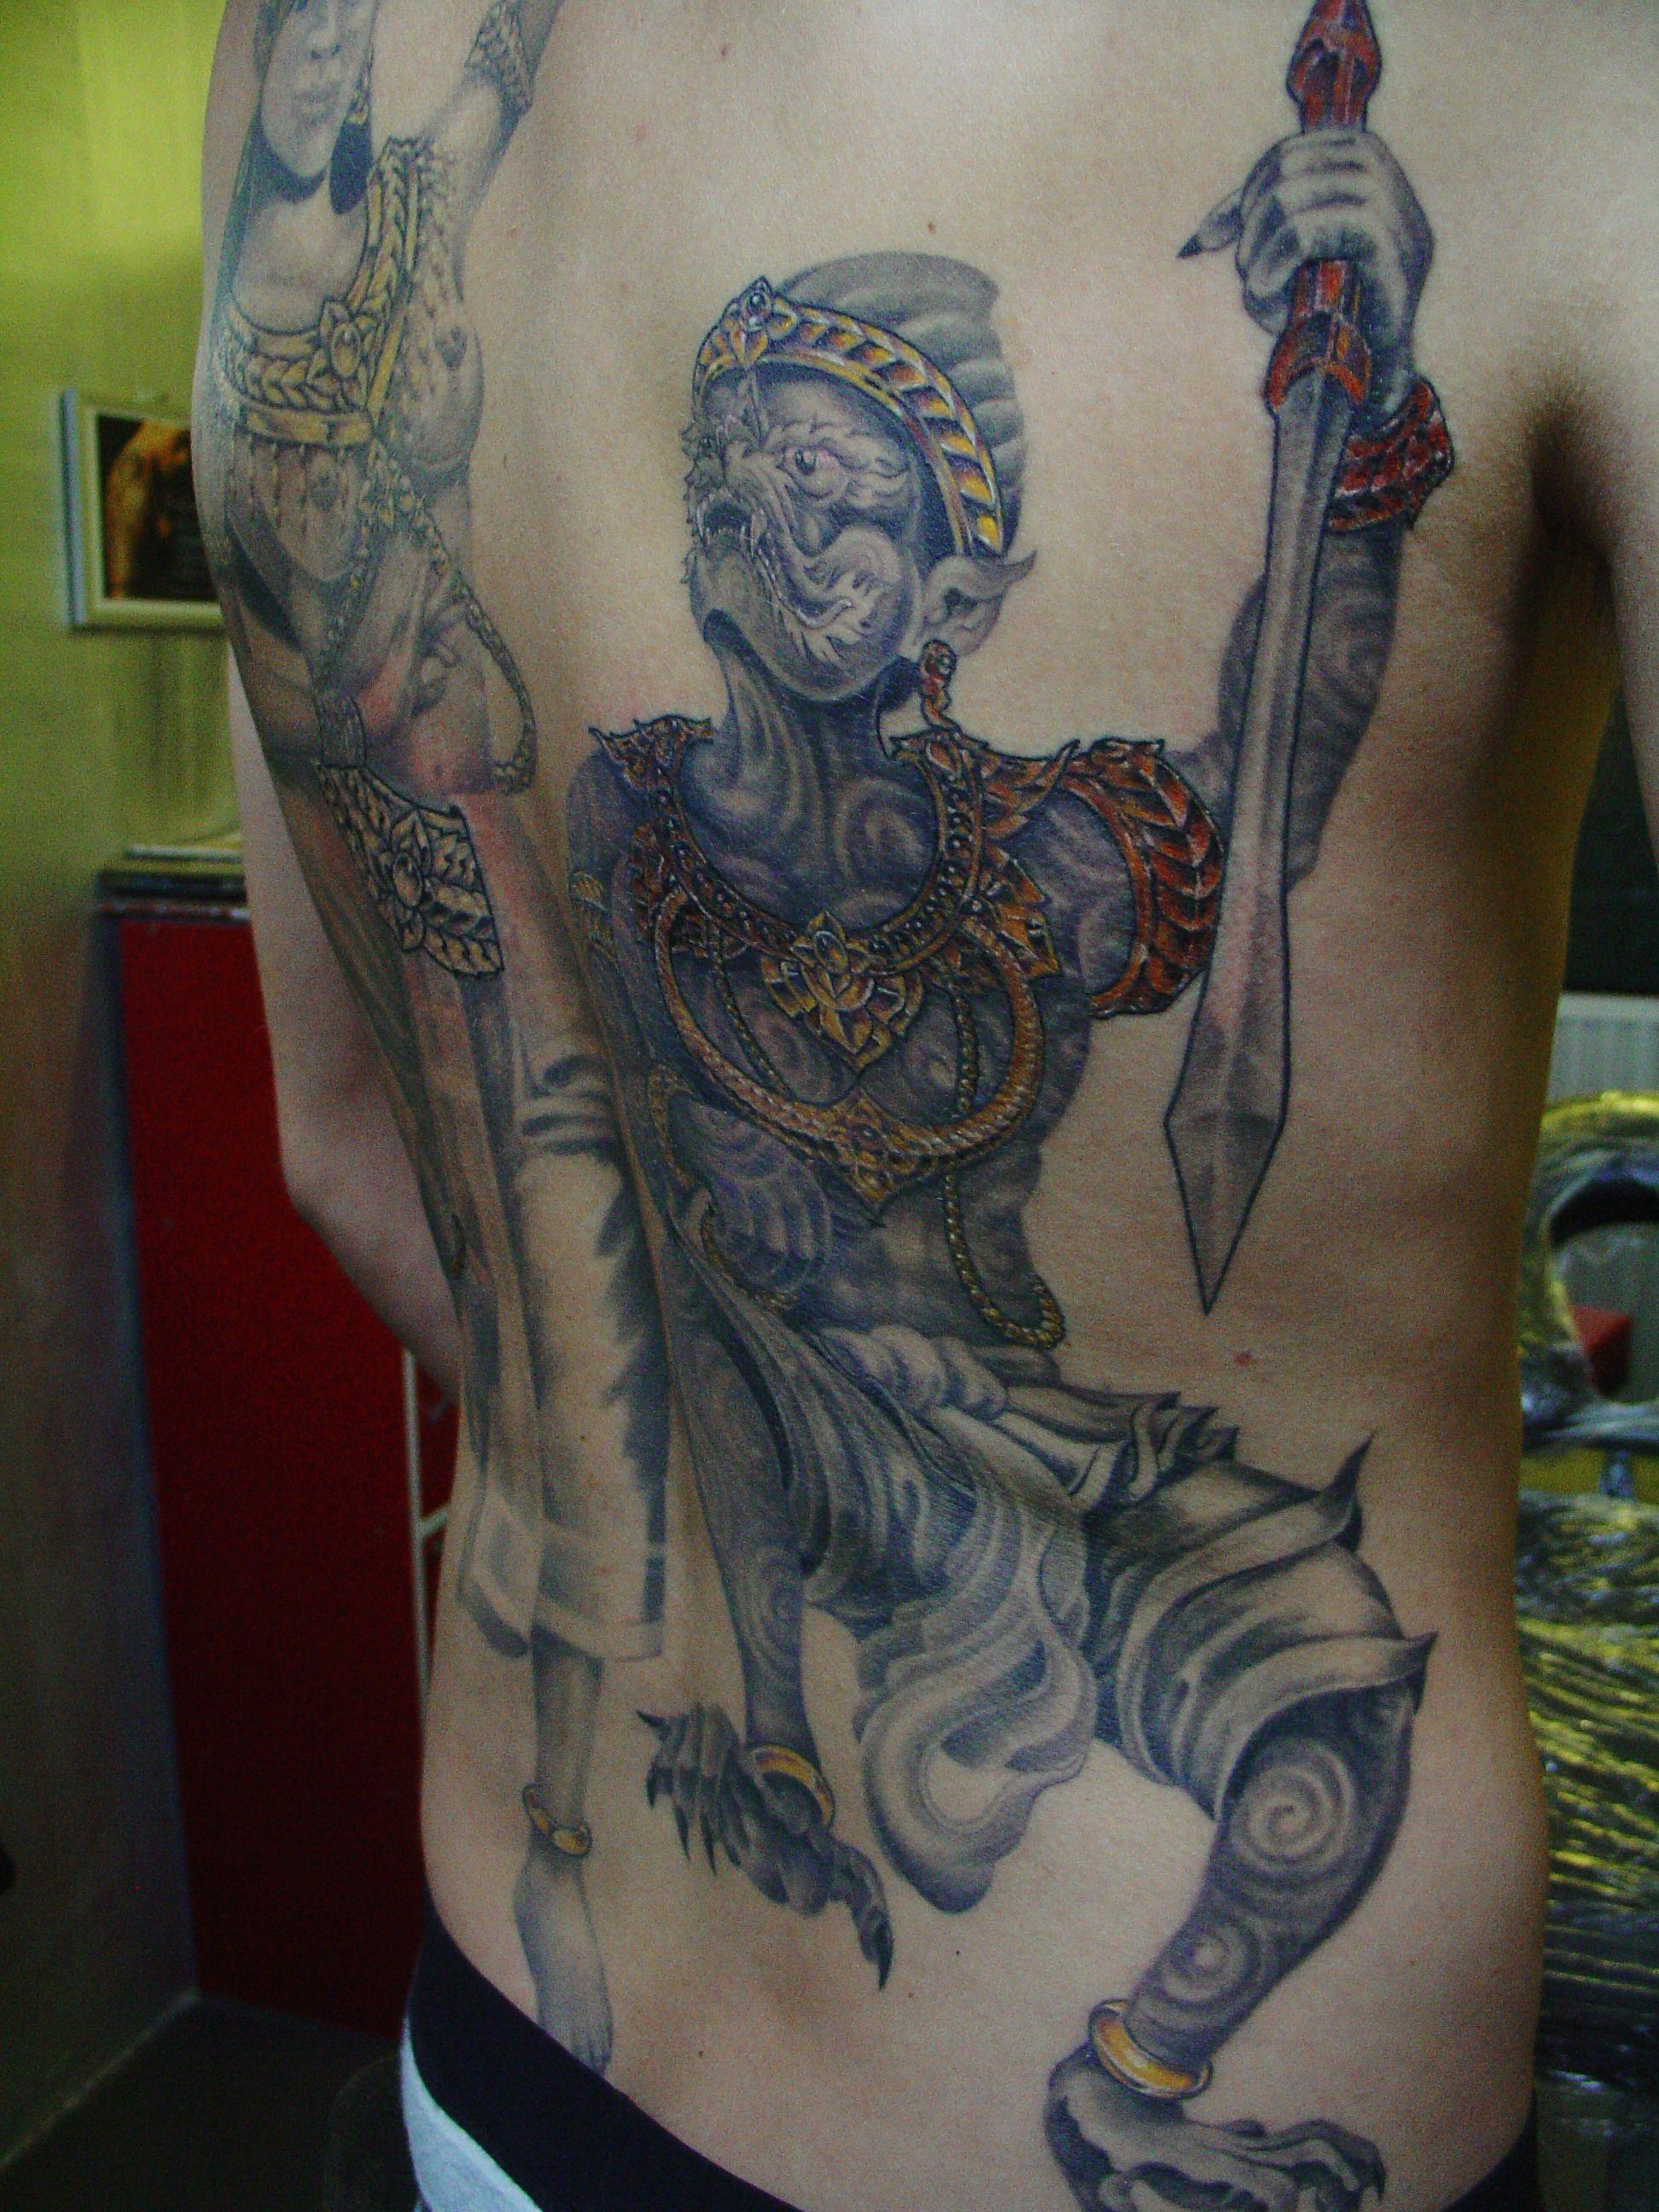 Fi Fireman Tattoo Designs - King of monkey tatoo custom tattoo free hand tattoo bamboo tatoo tattoo design design tatoo